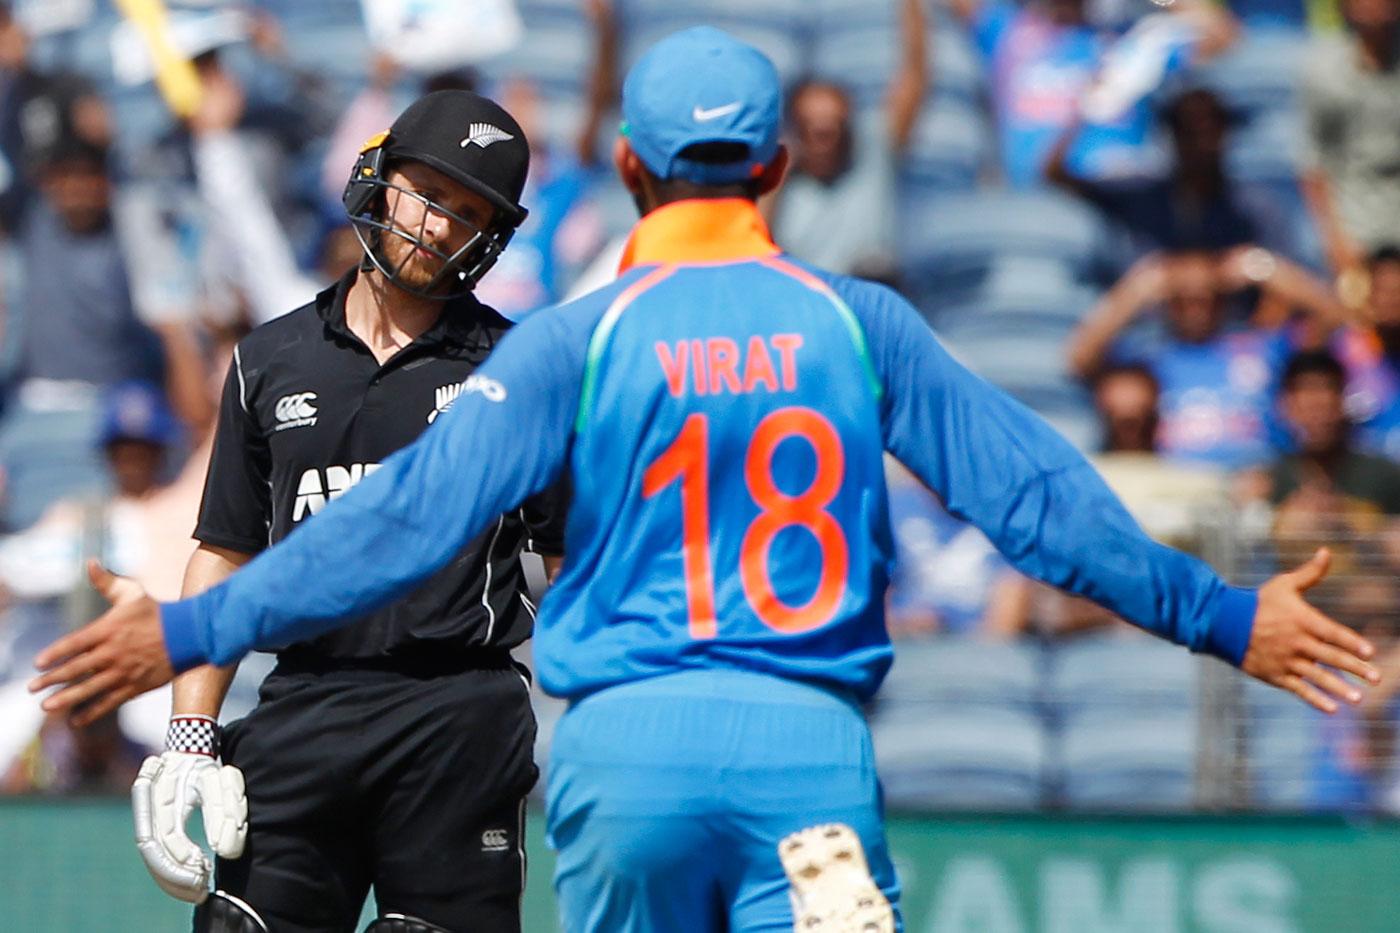 IND vs NZ 2017: Watch - Virat Kohli Dances With His Teammates Ahead of Series-Decider 2